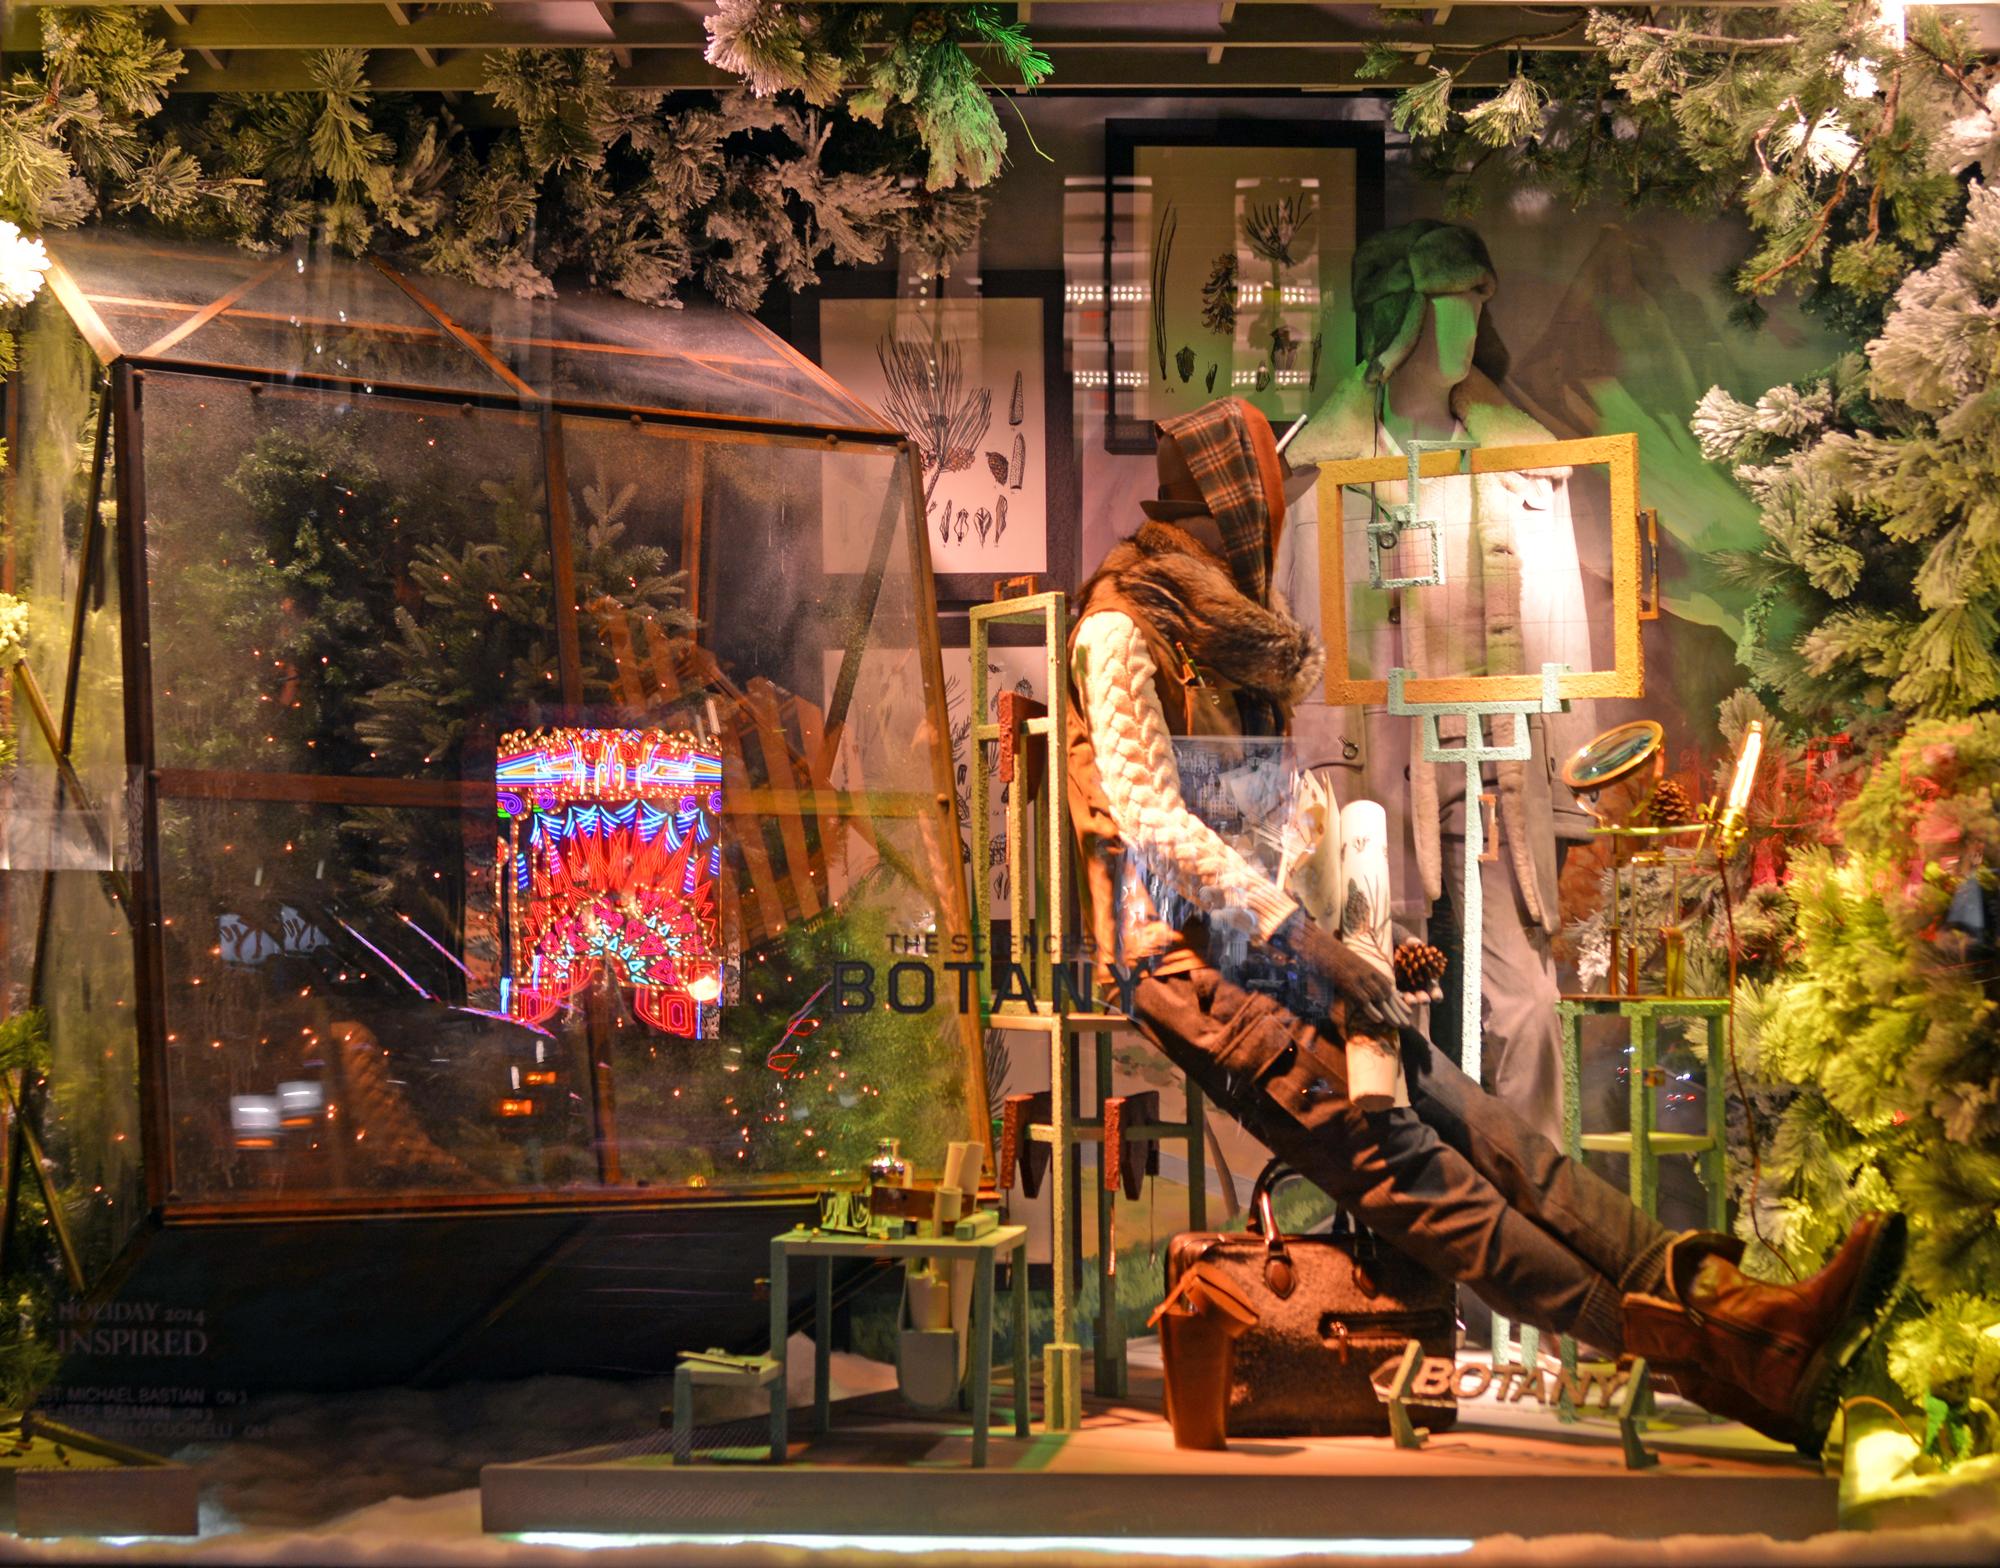 Botany - Bergdorf Goodman Men's | Lauren L Caron © 2014